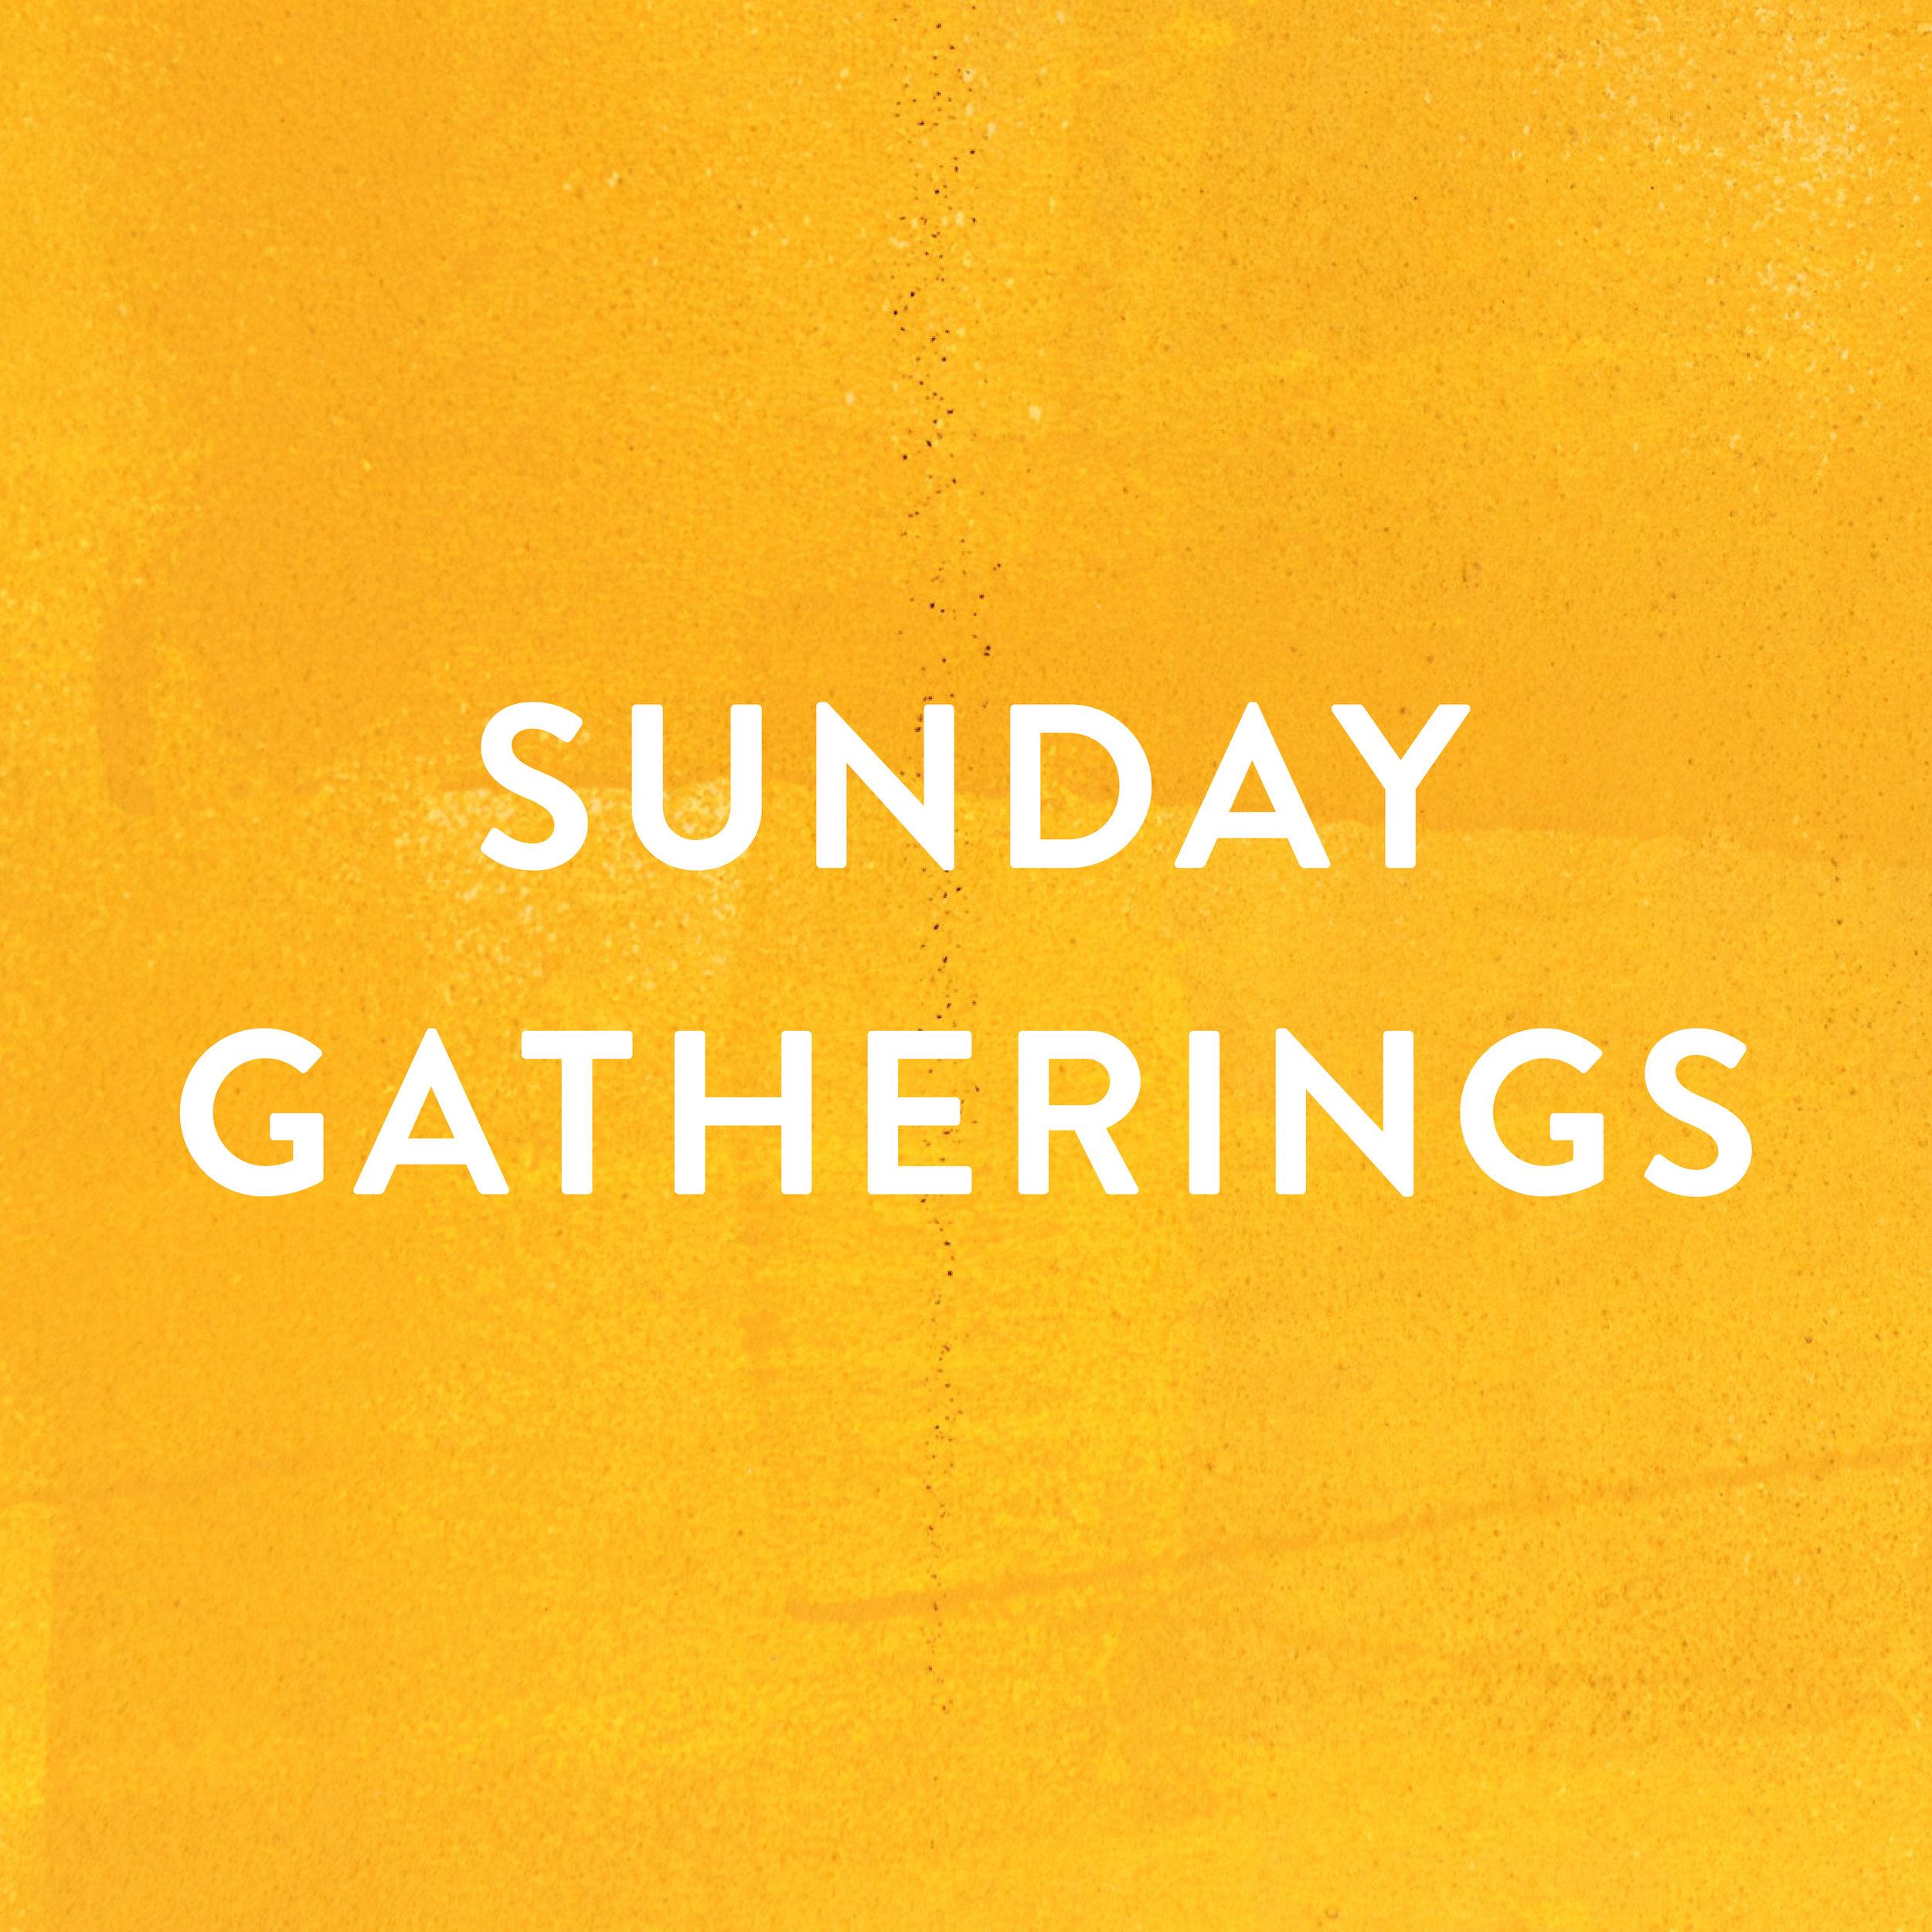 sunday gatherings.jpg